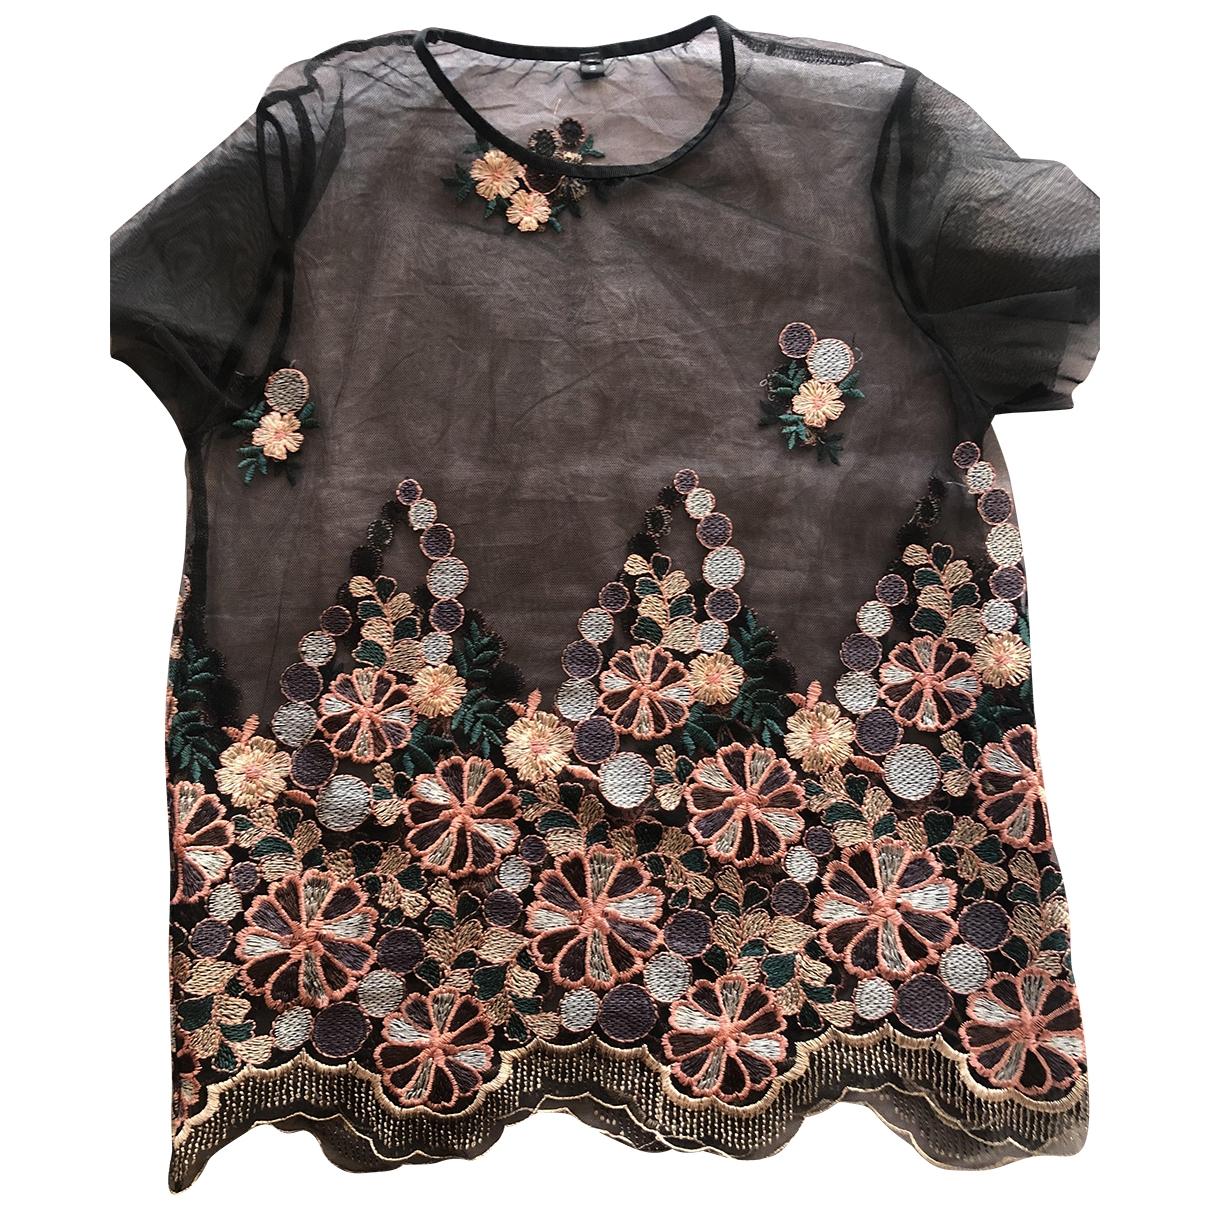 Impérial \N Black dress for Women S International